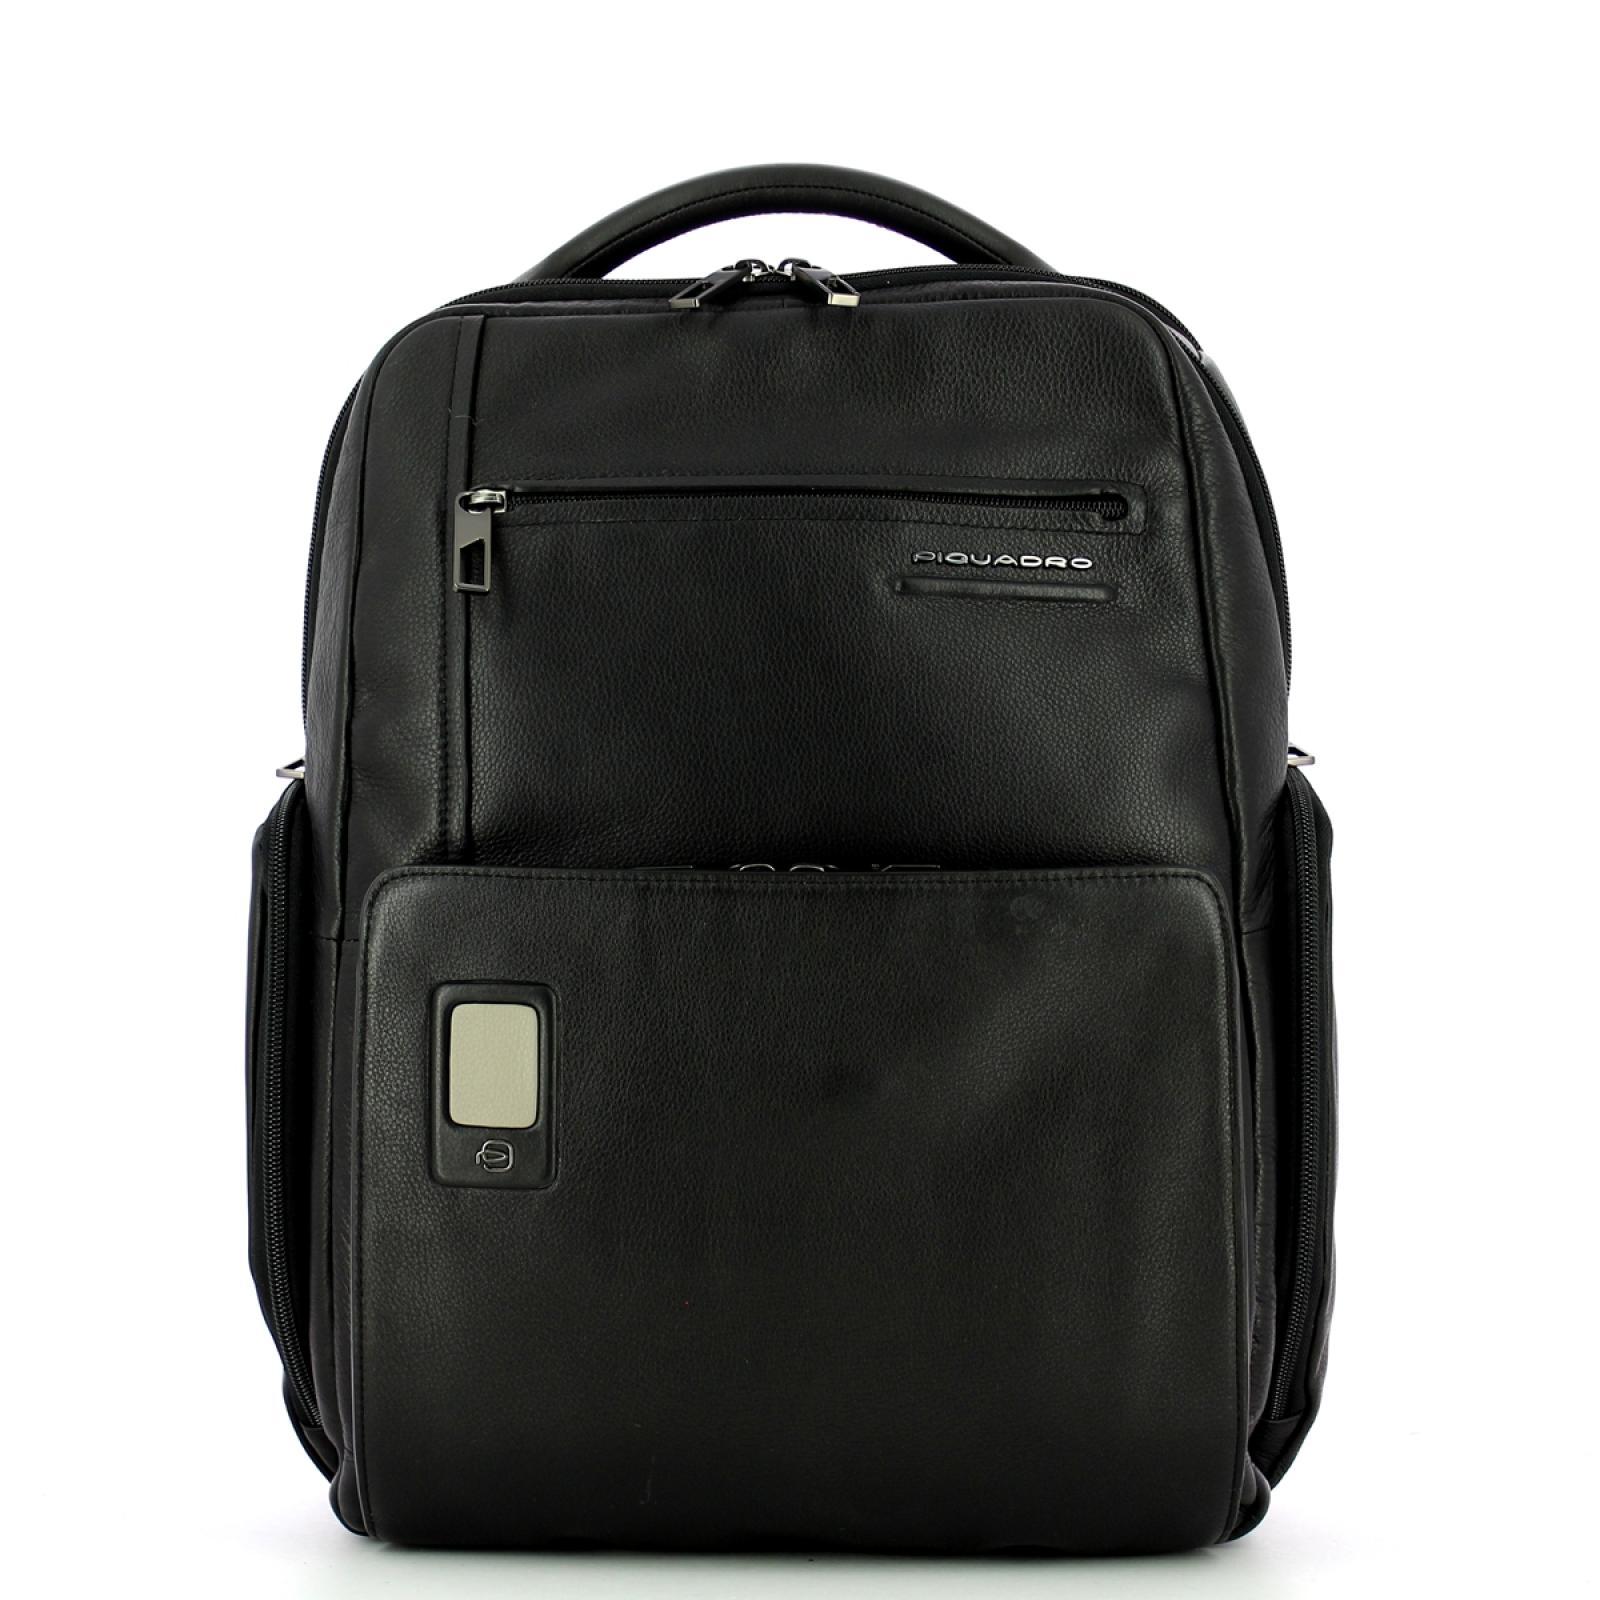 Piquadro Zaino Fast-Check  Porta PC 15.6 Akron - 1